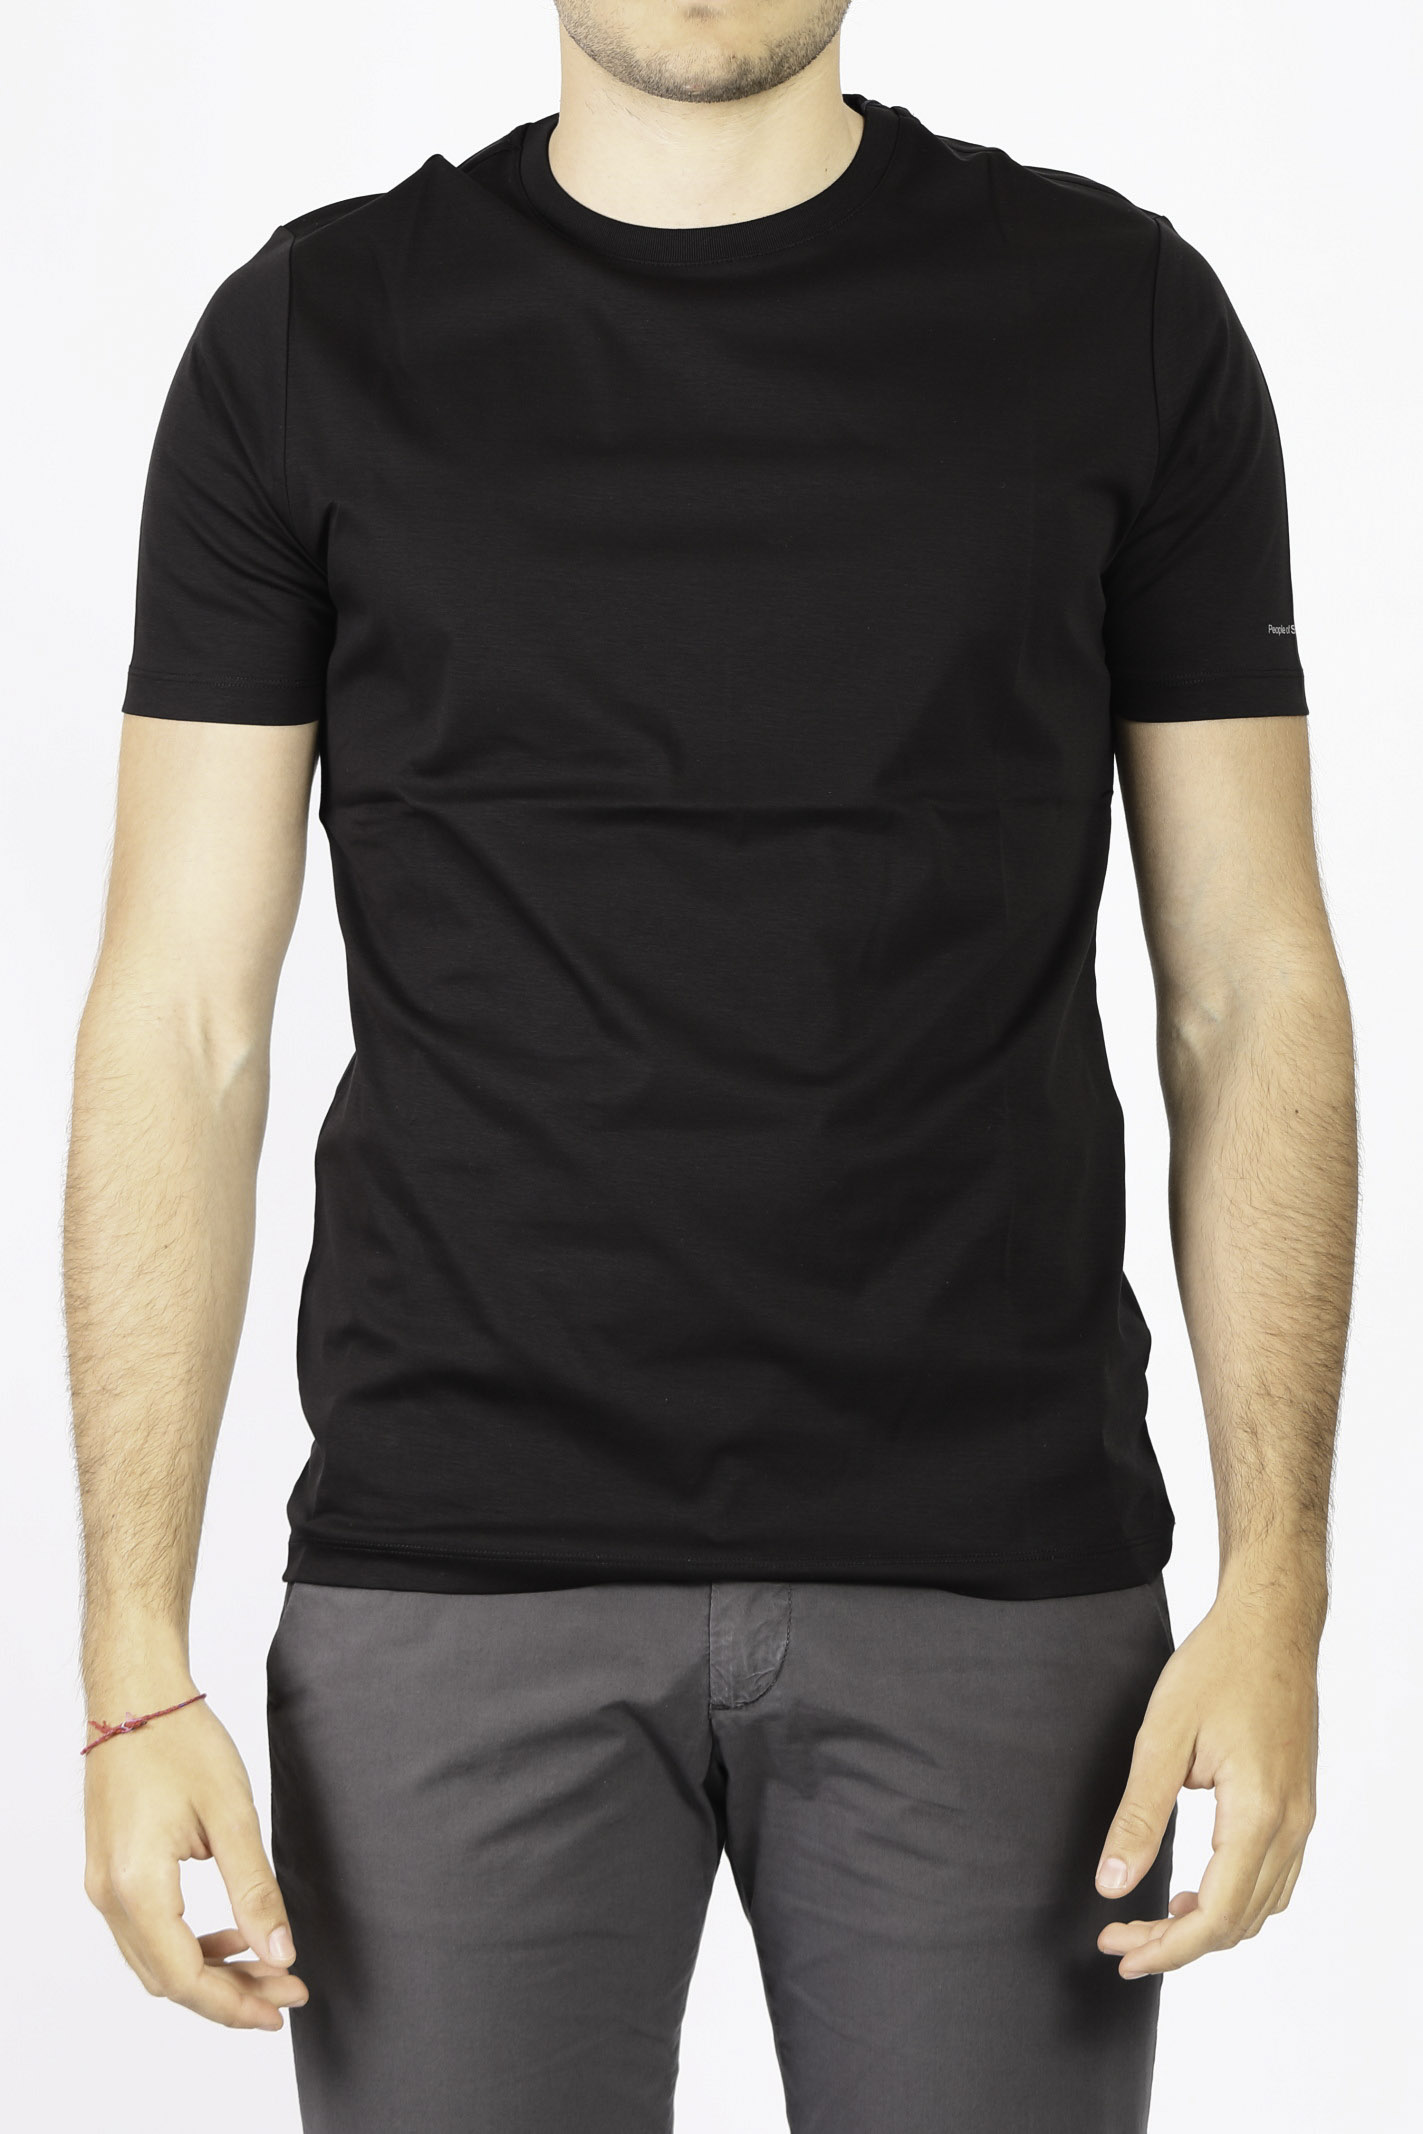 COTTON T-SHIRT PEOPLE OF SHIBUYA | T-shirt | SHIKO-PM444999